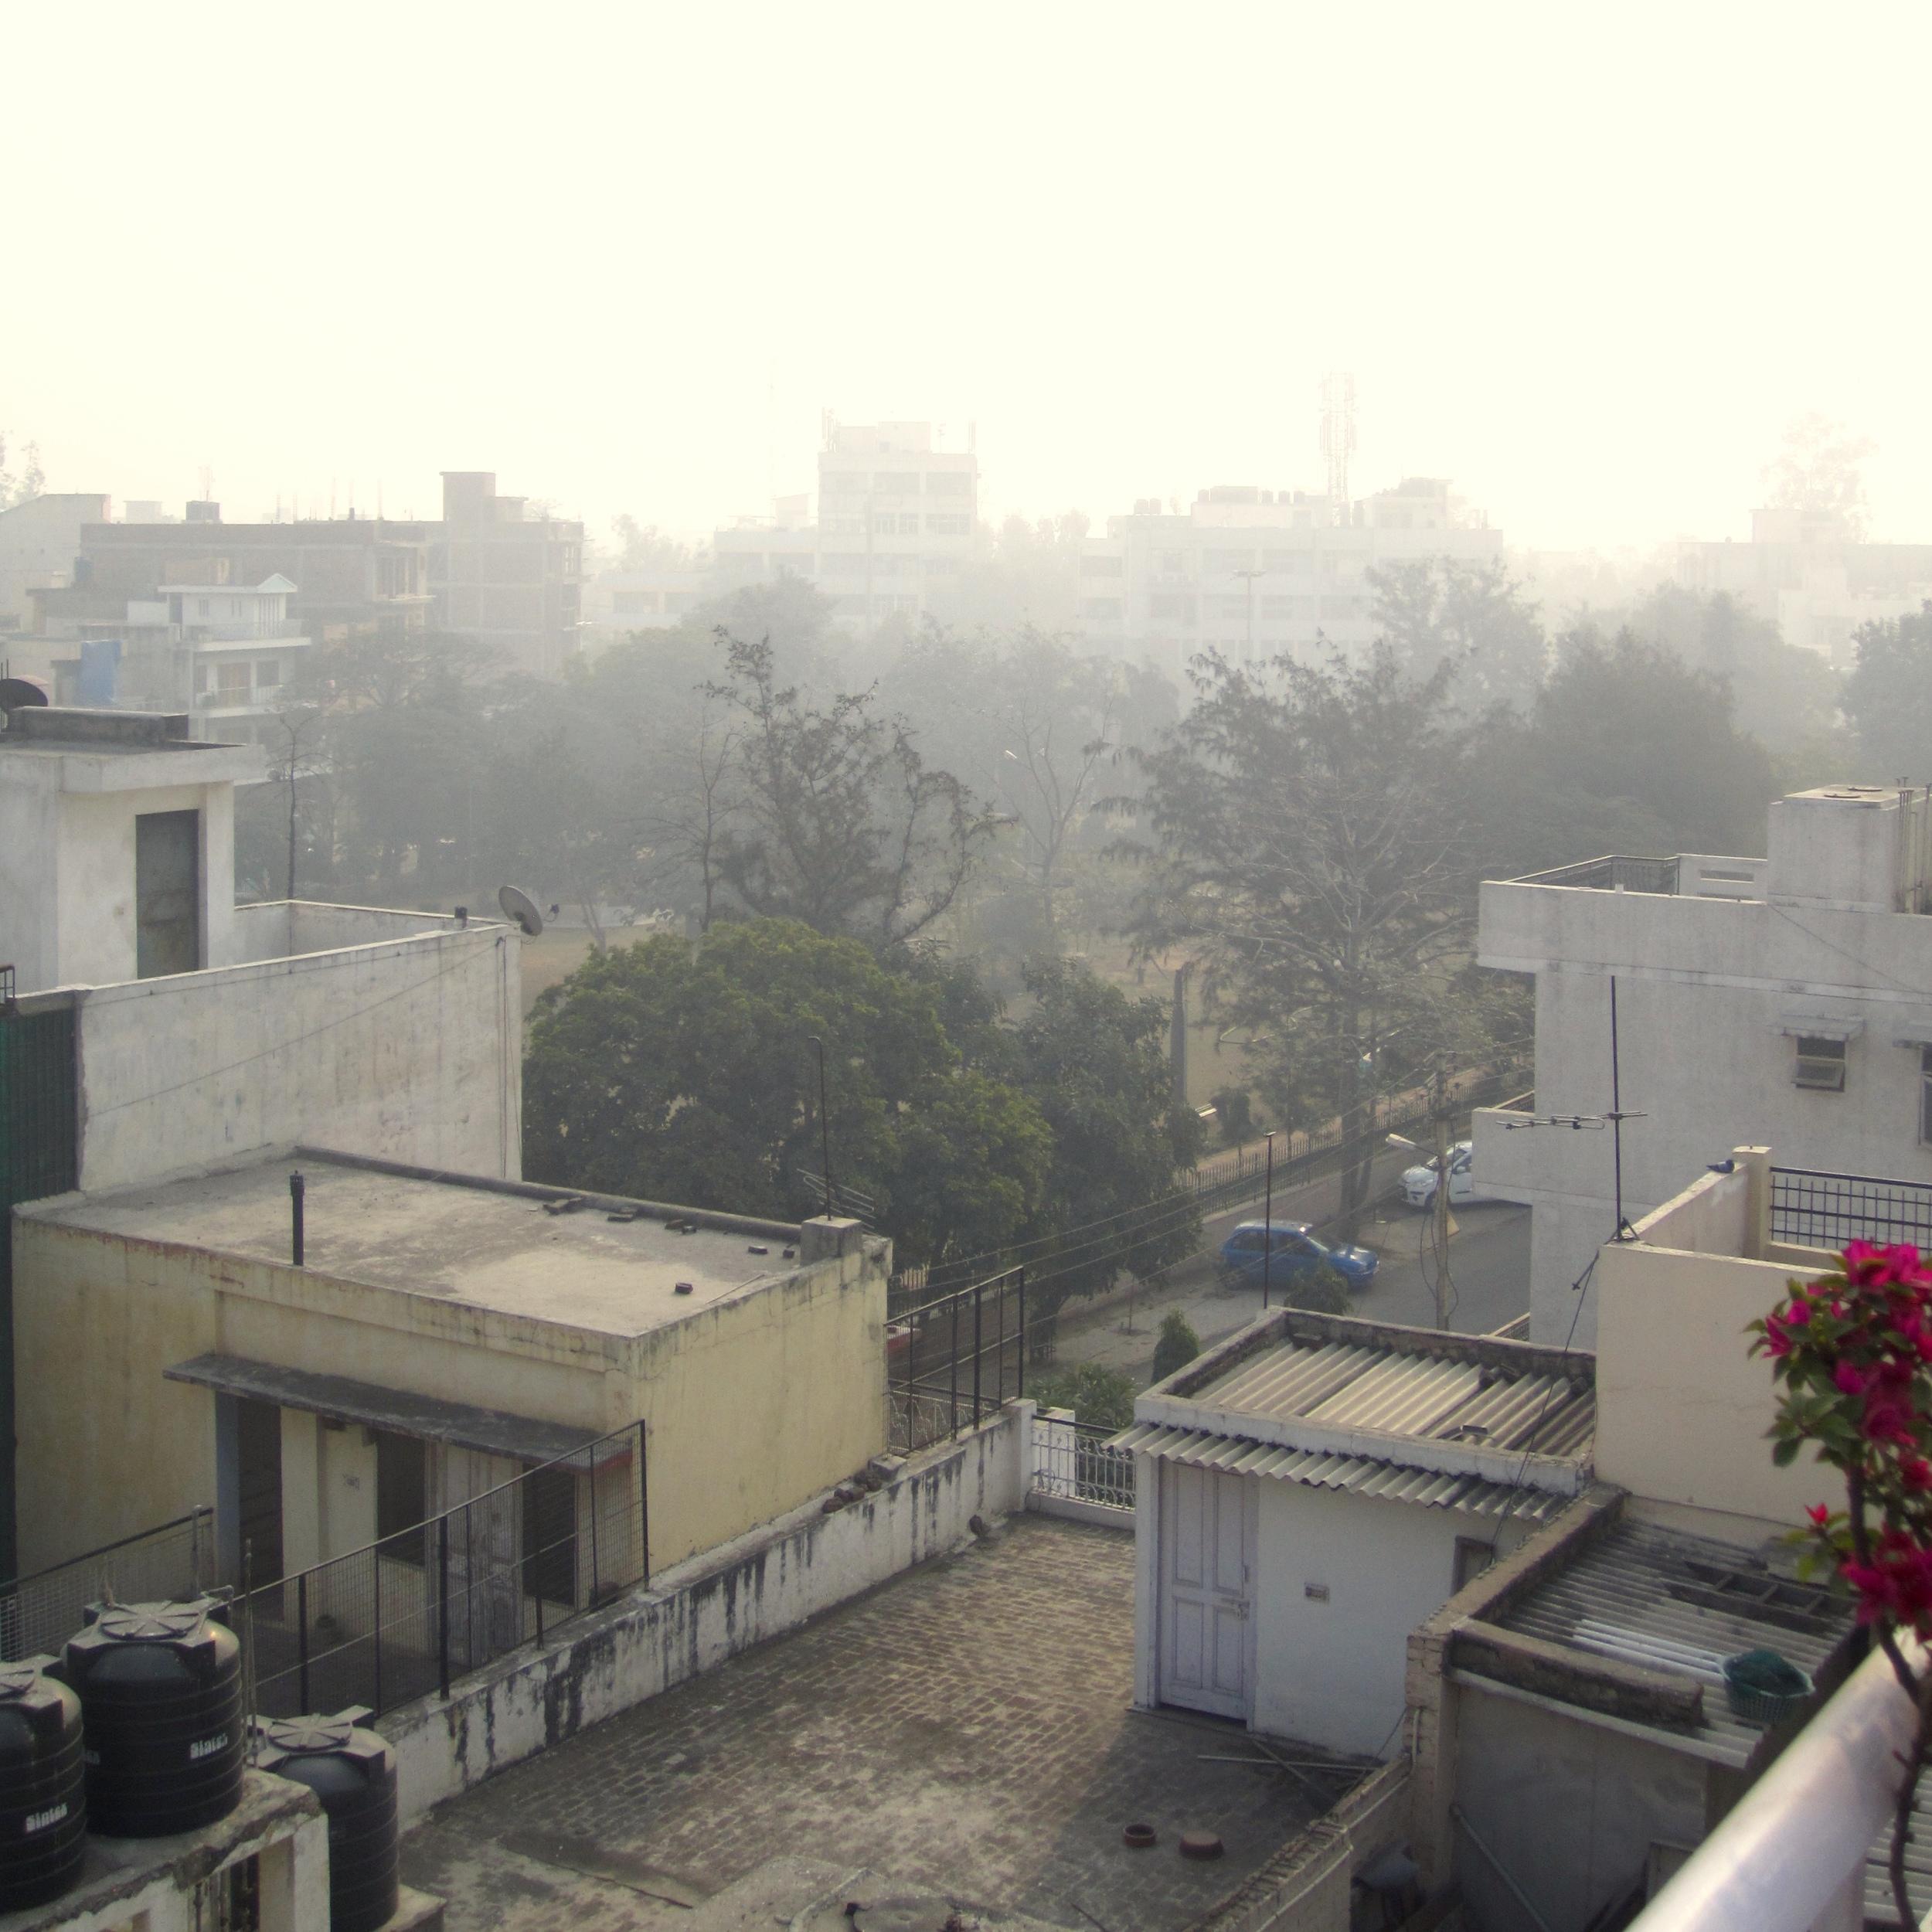 Delhi Agra 28Dec12 (3).jpg